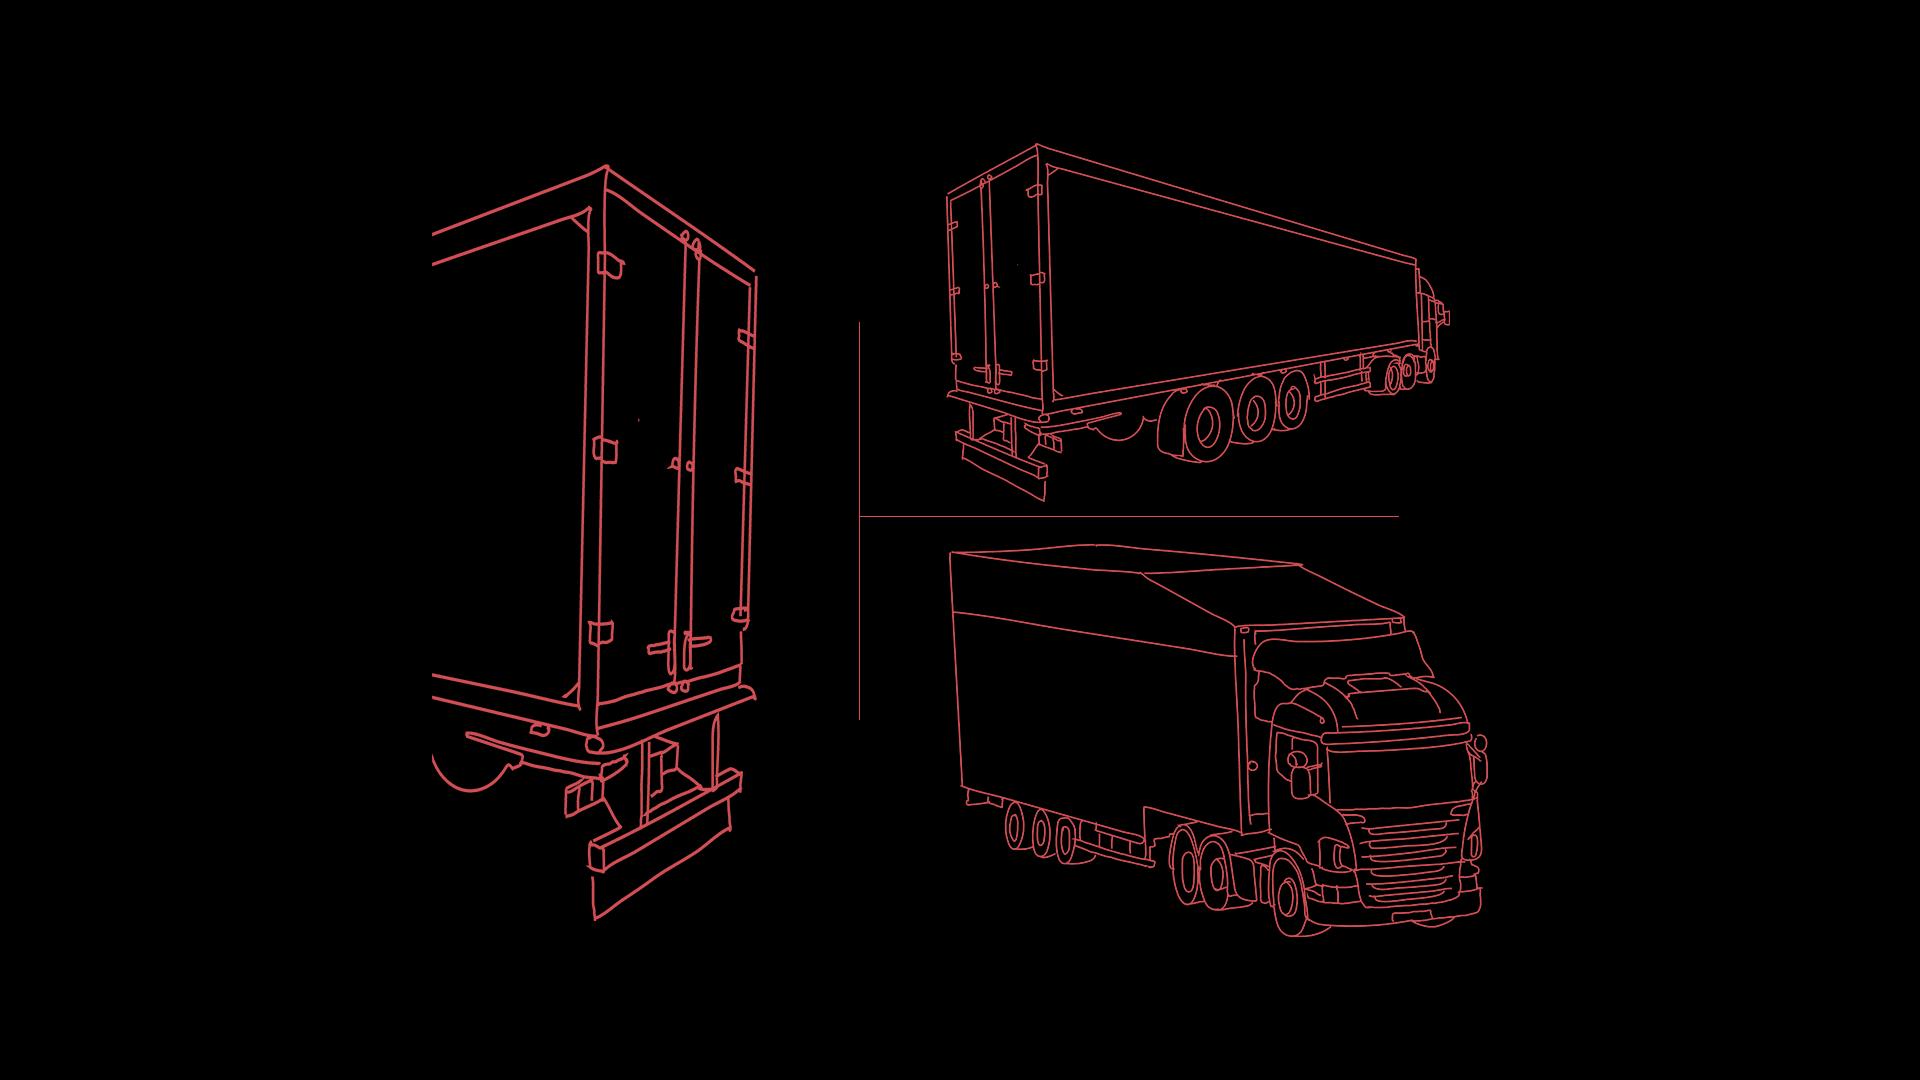 https://www.truckadz.co.uk/wp-content/uploads/2021/03/media-formats-1.png